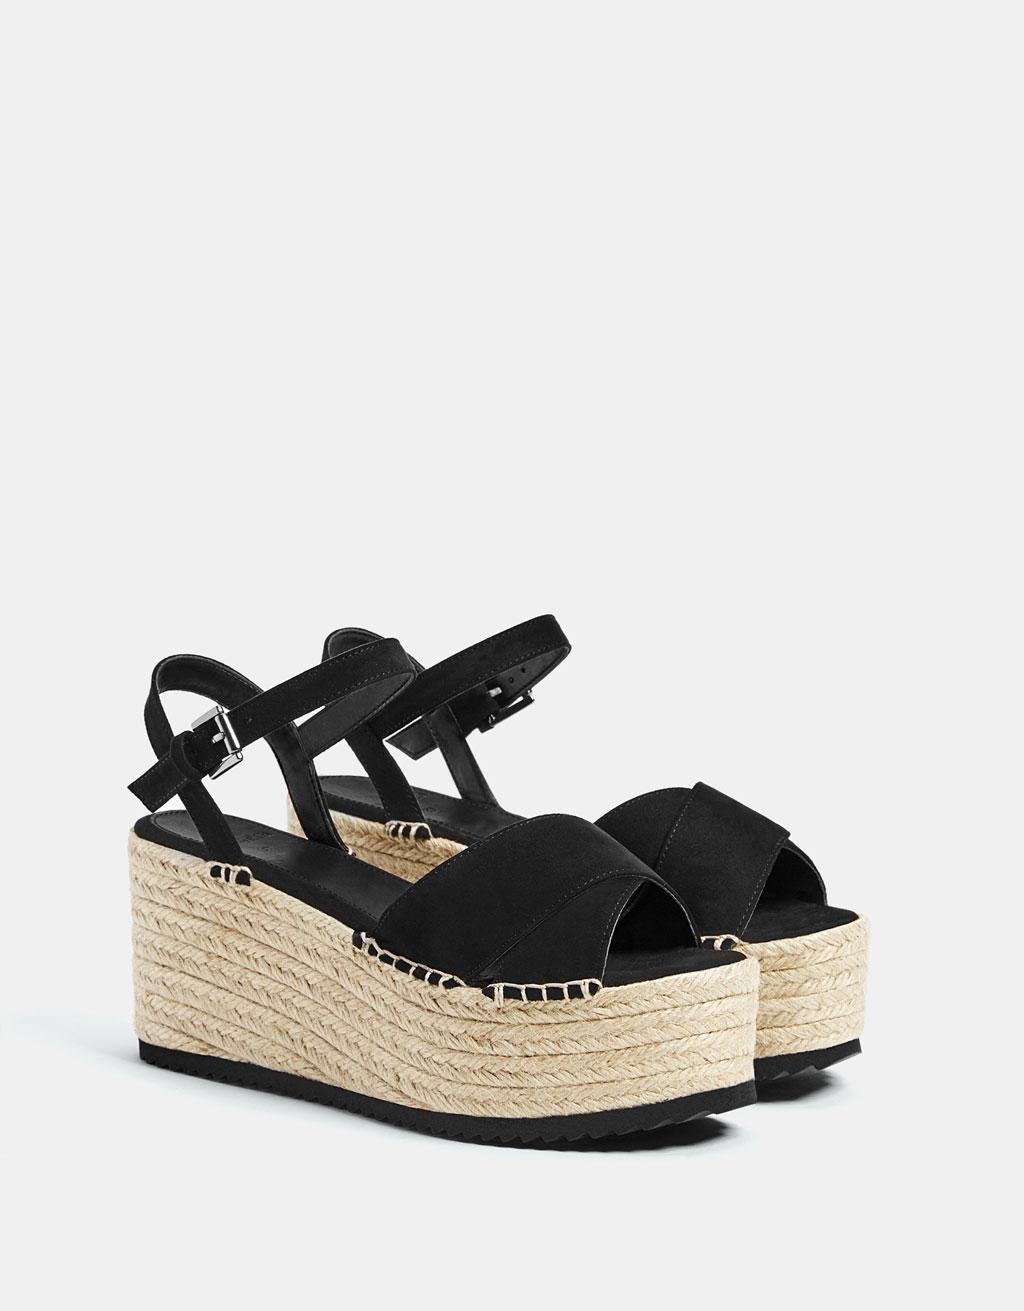 Black jute platform sandals